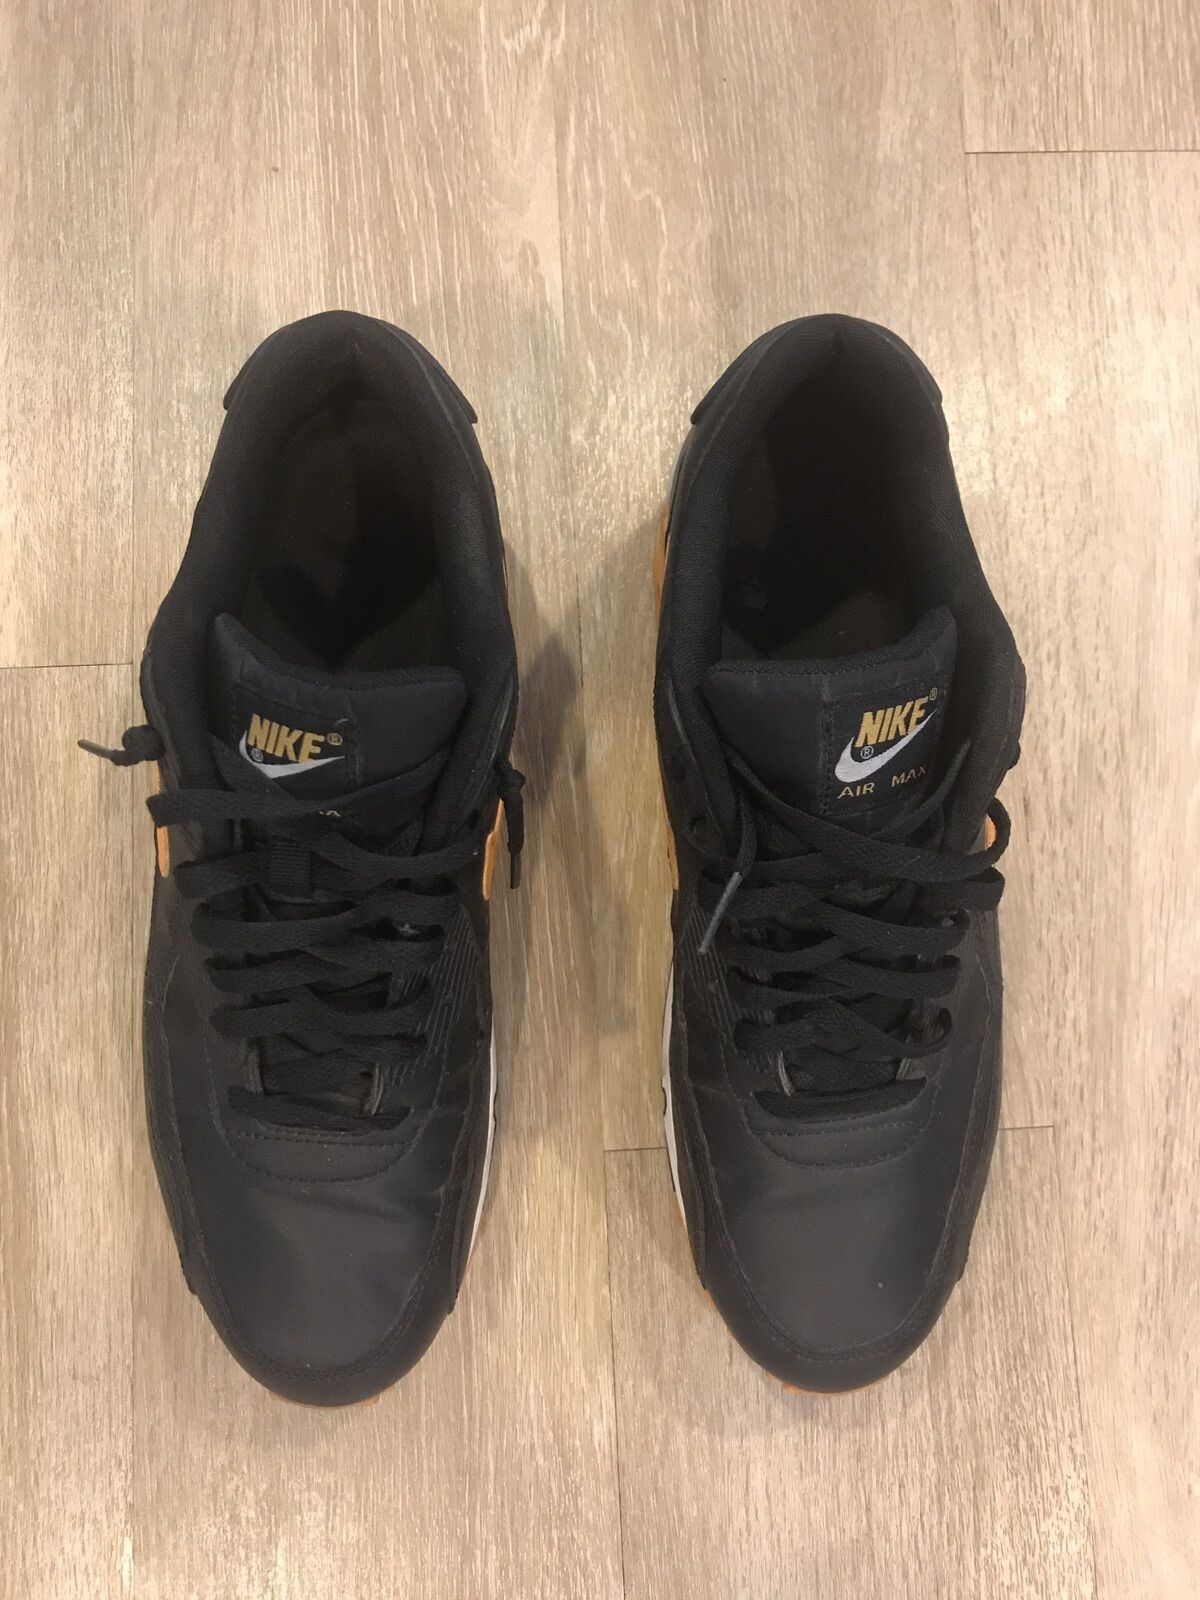 Black & Orange S:Mens Nike Air Max in Good Condition